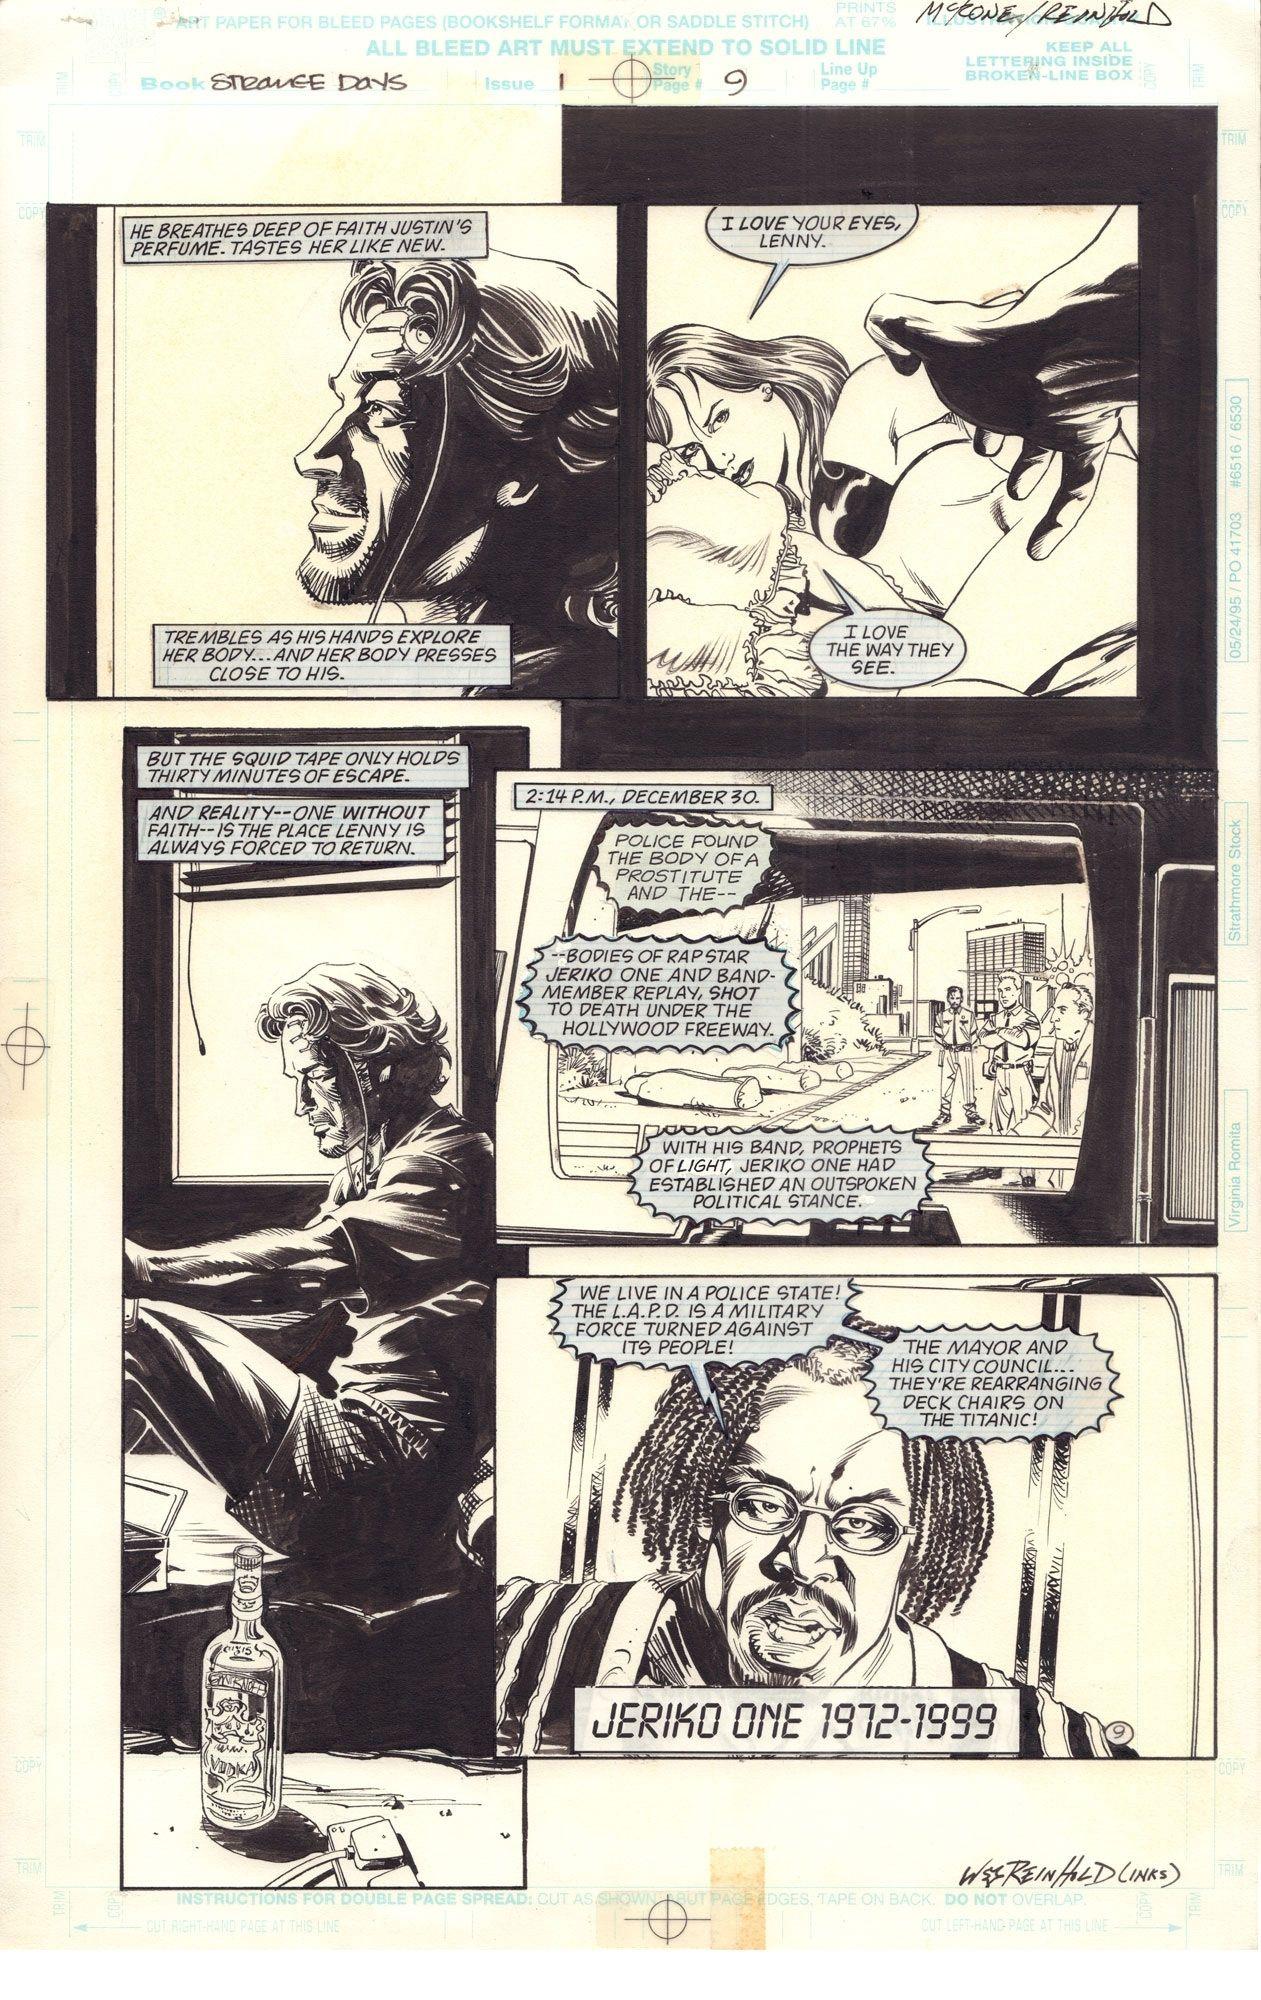 Strange Days: Movie Adaptation, s. 9